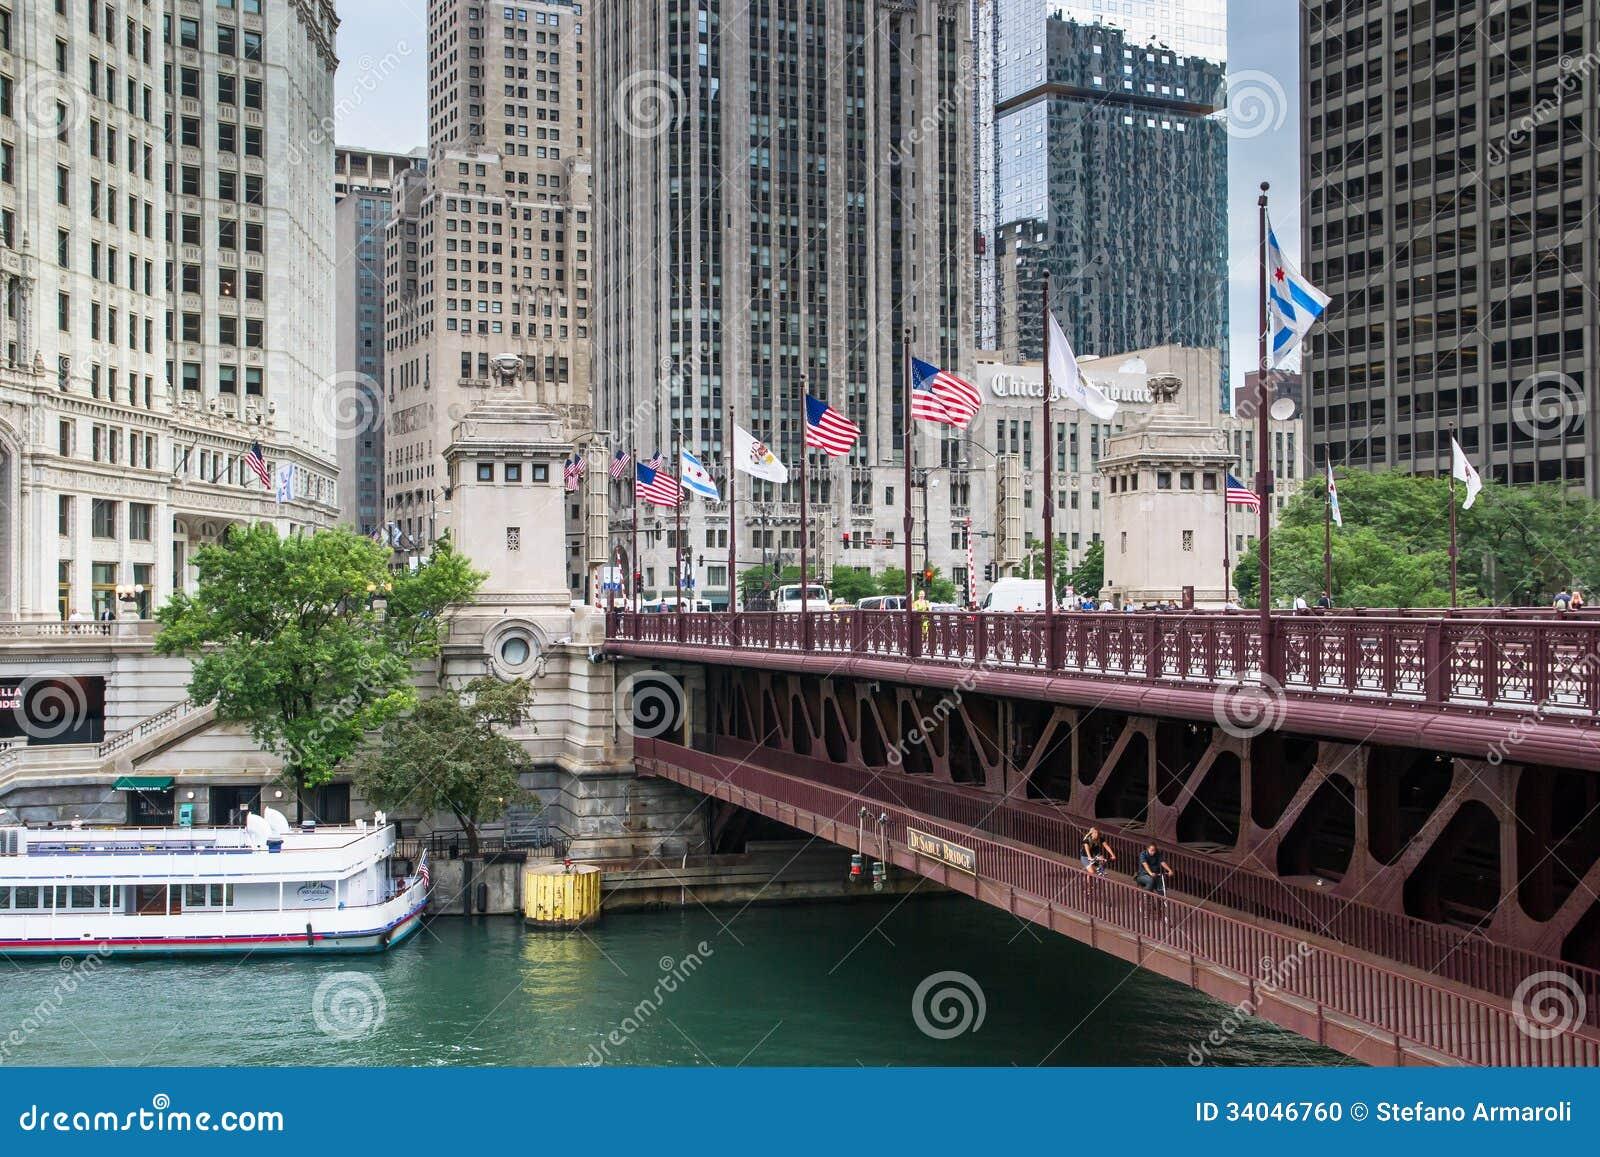 chicago backlight bridge - photo #41